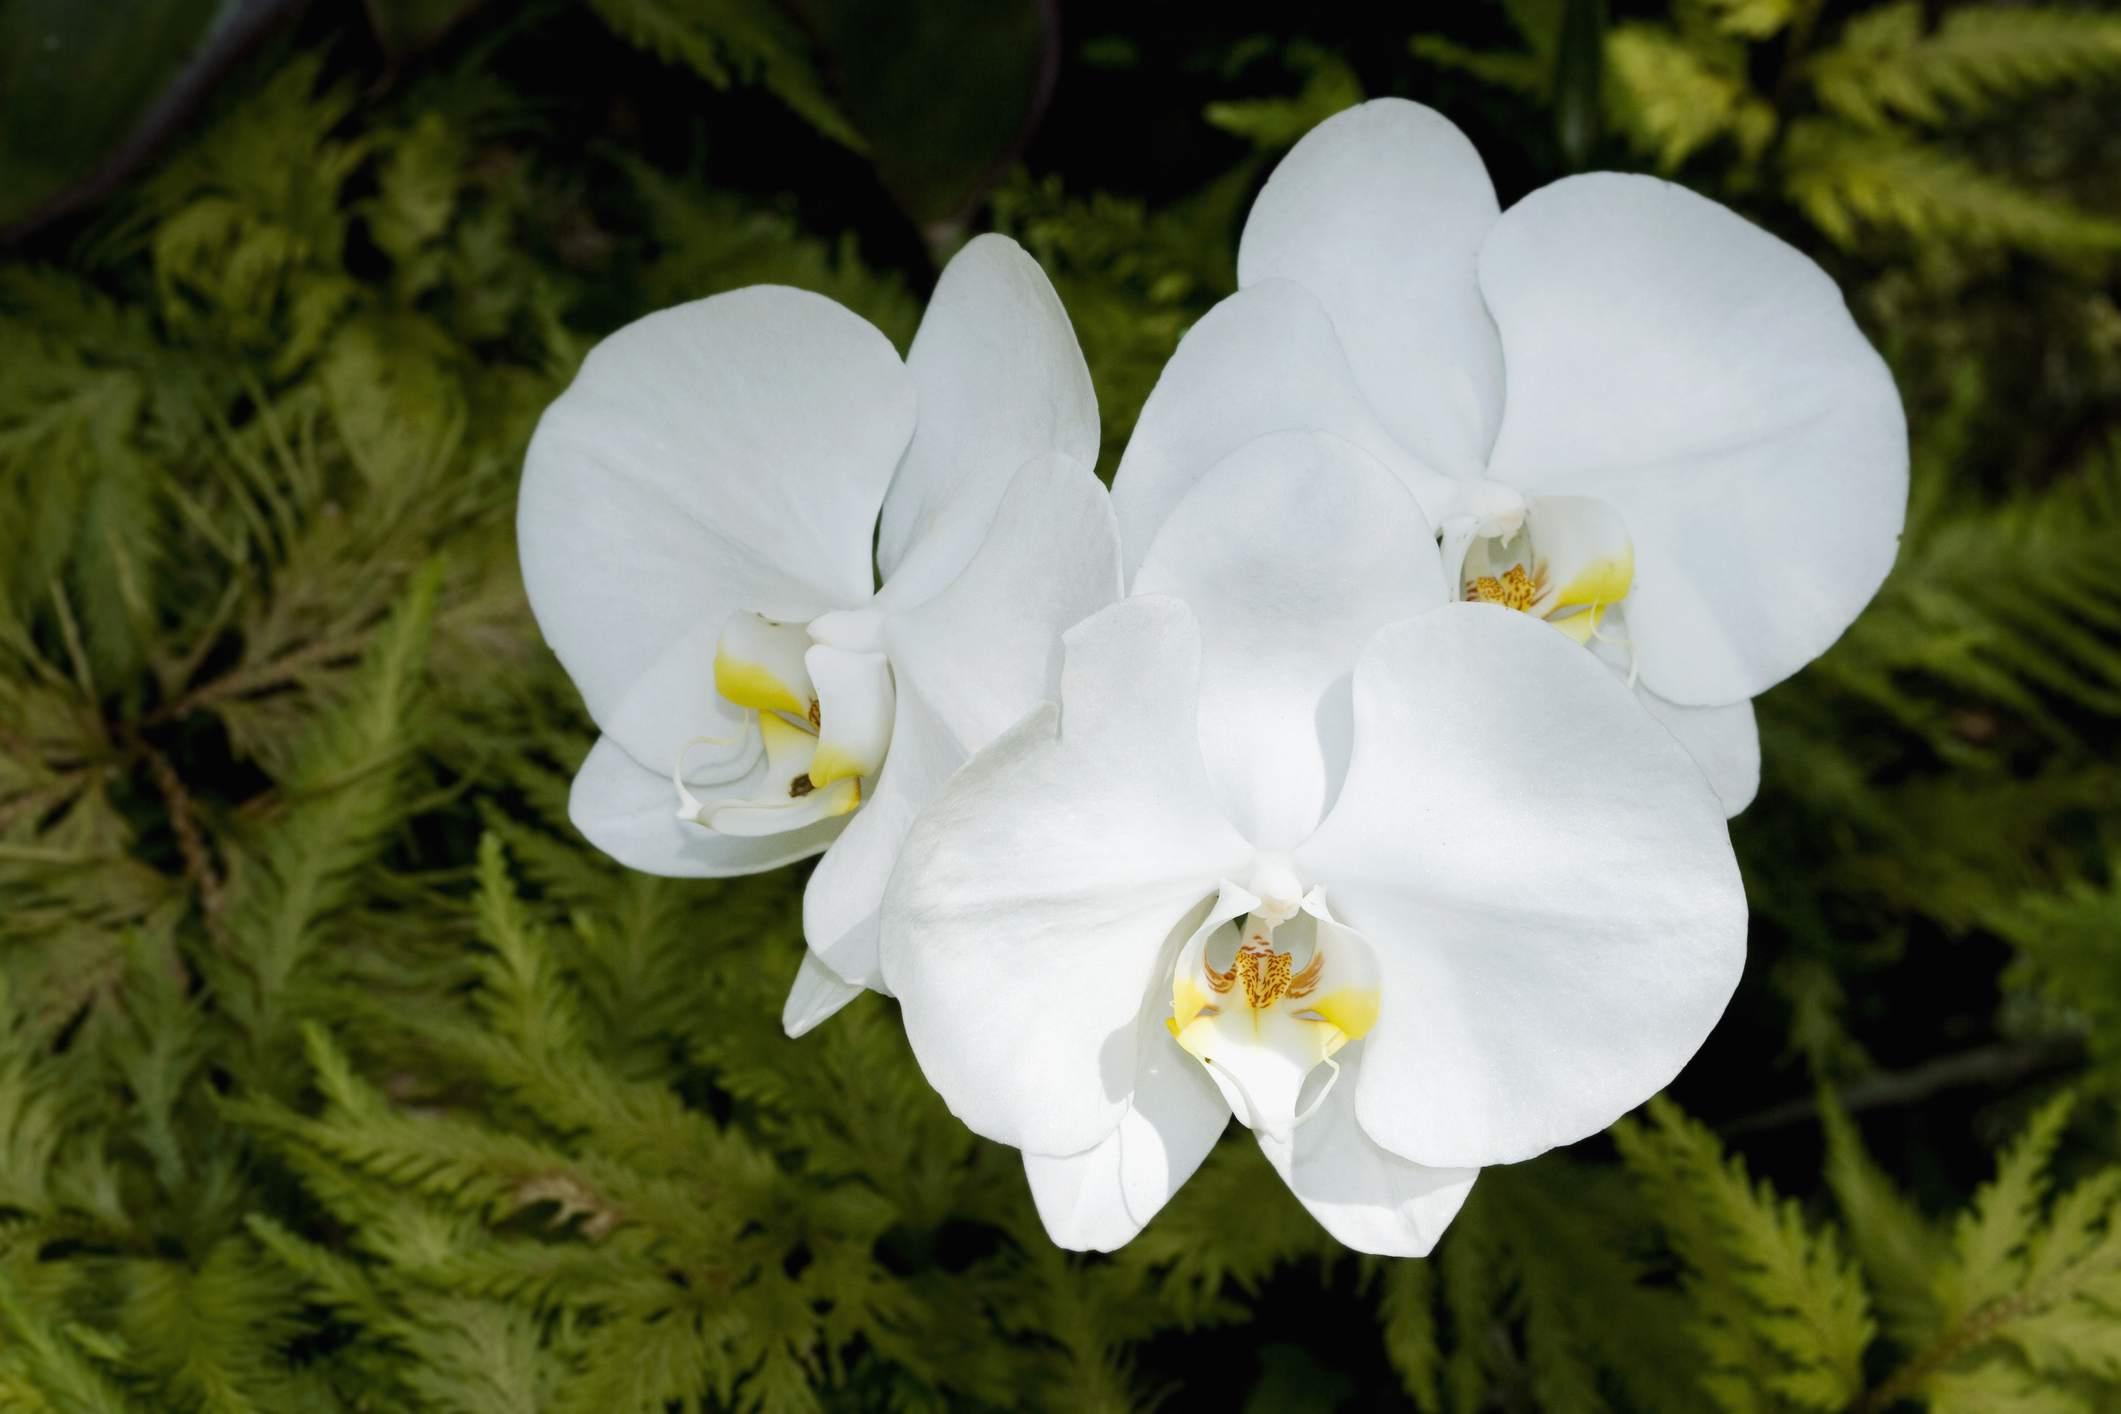 Close-up of orchid flowers in a botanical garden, Hawaii Tropical Botanical Garden, Hilo, Big Island, Hawaii, USA